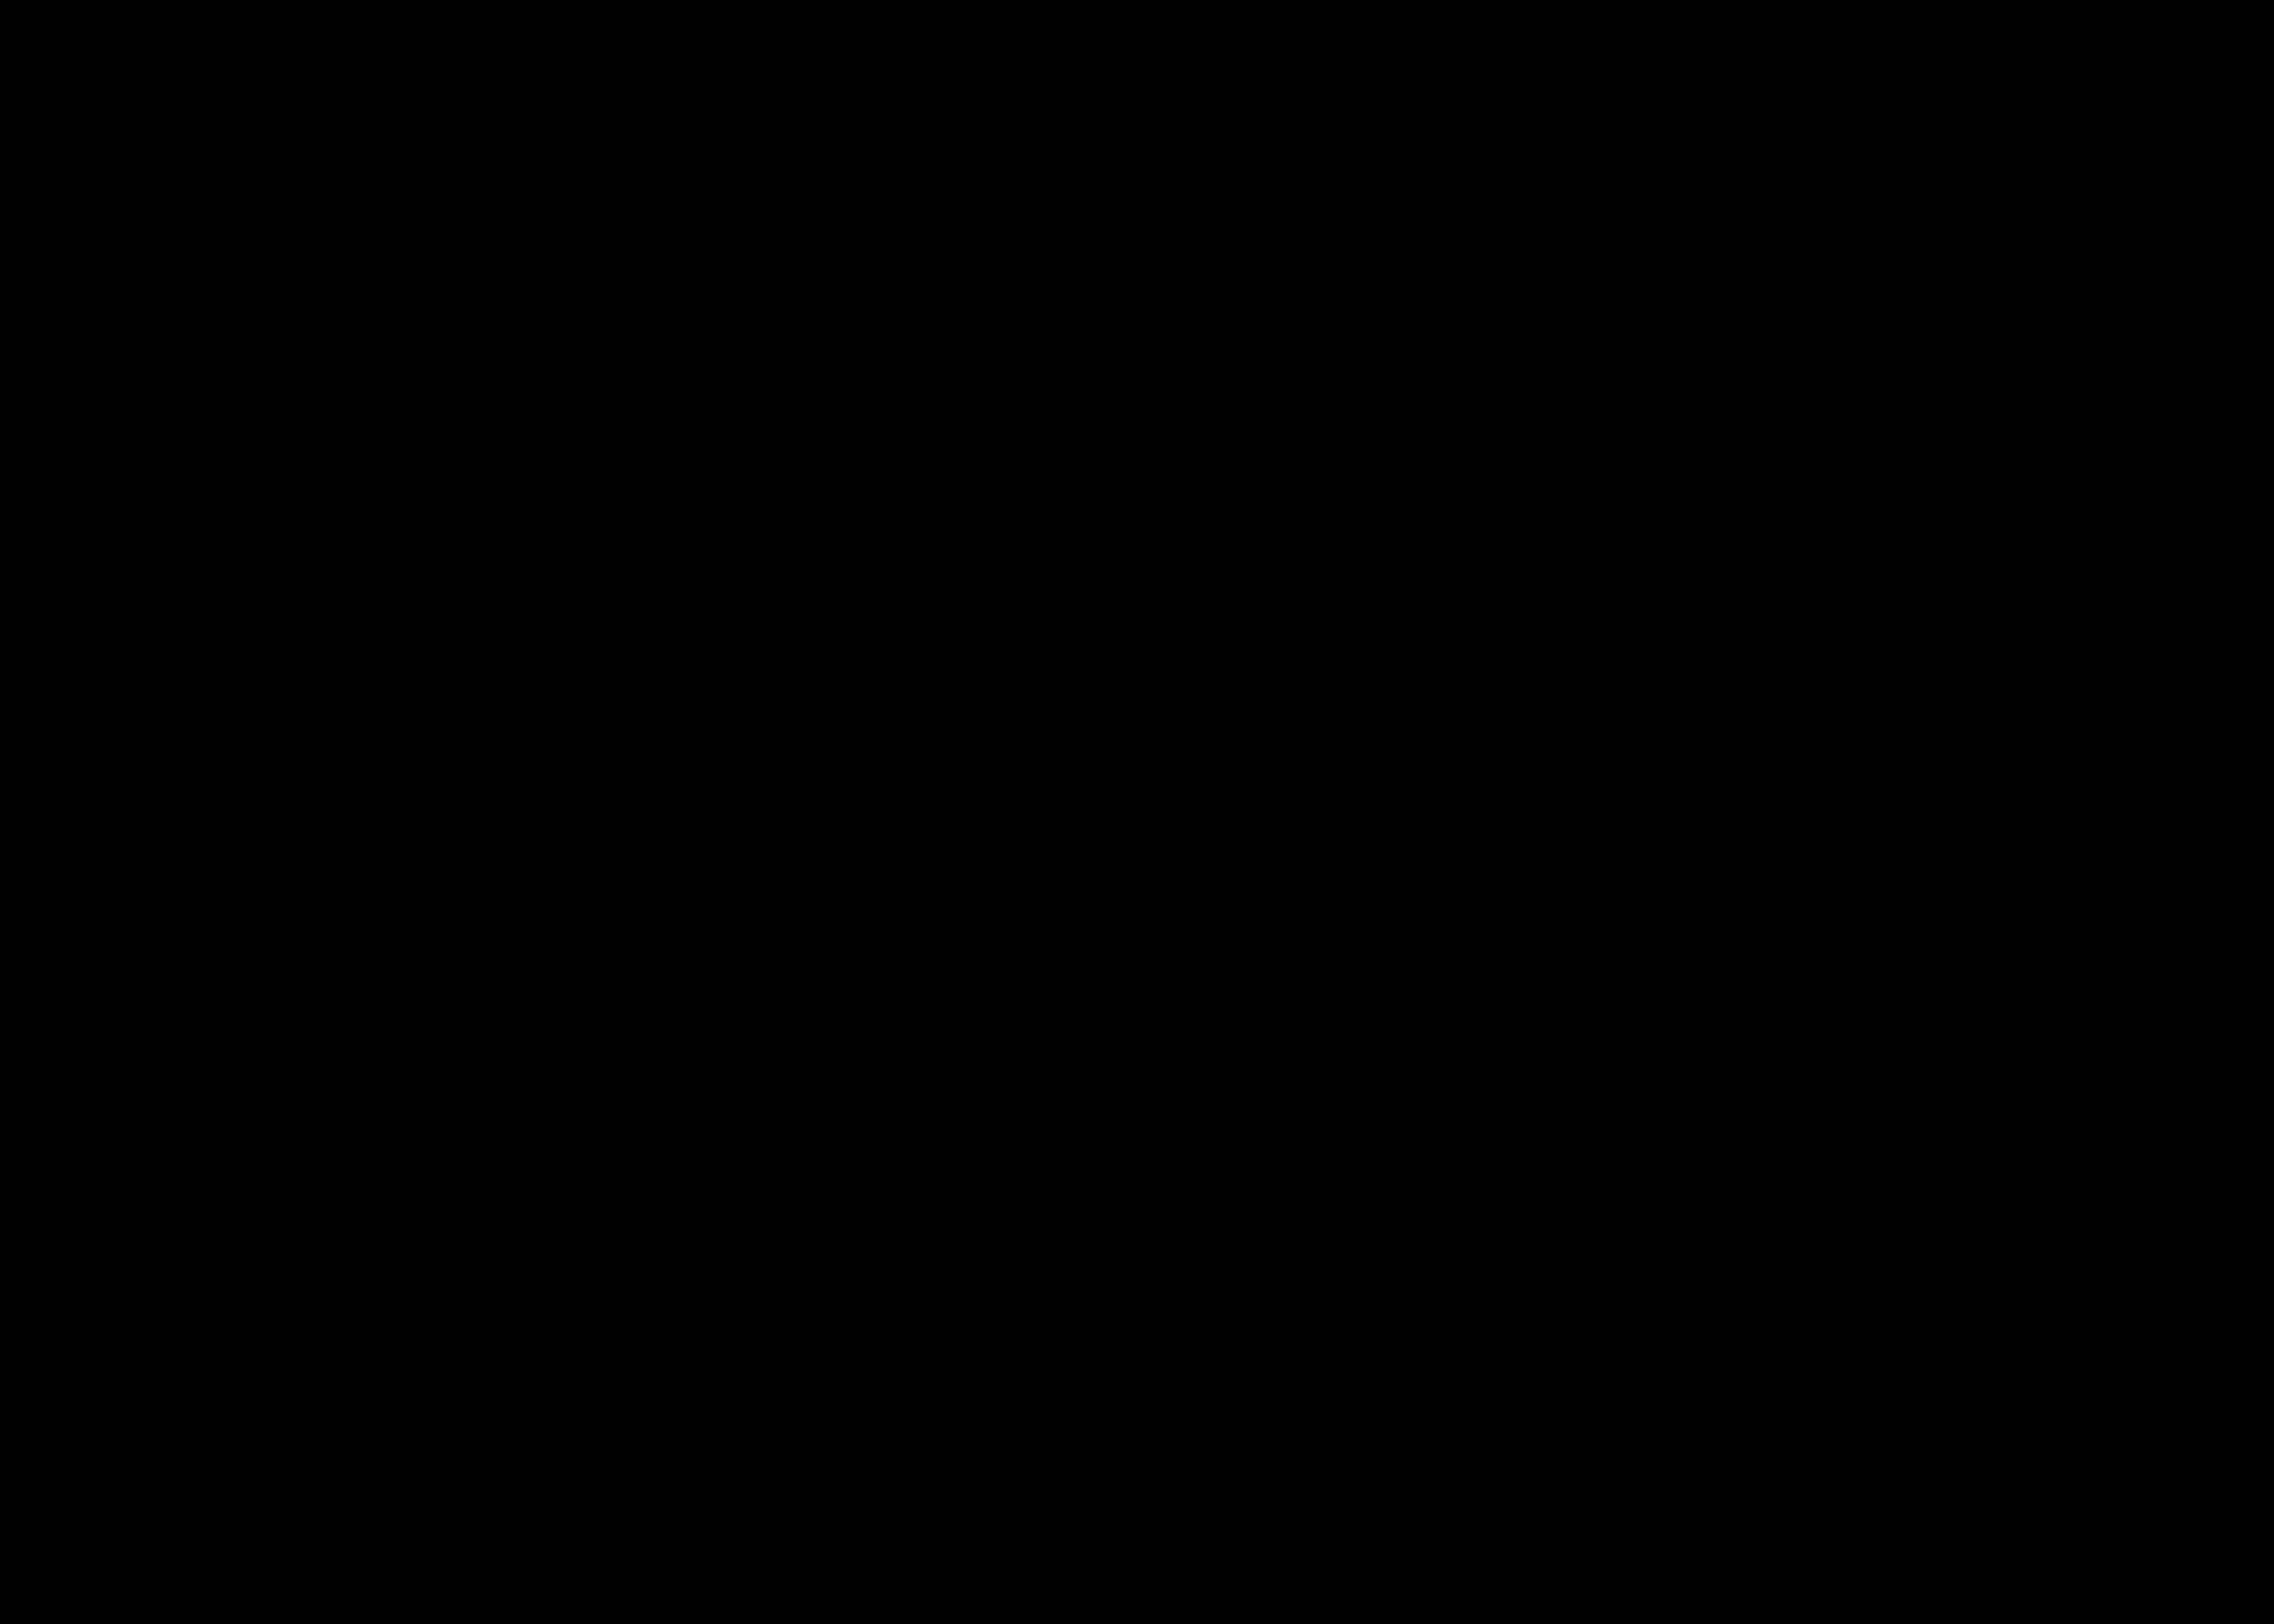 2400x1714 Clipart